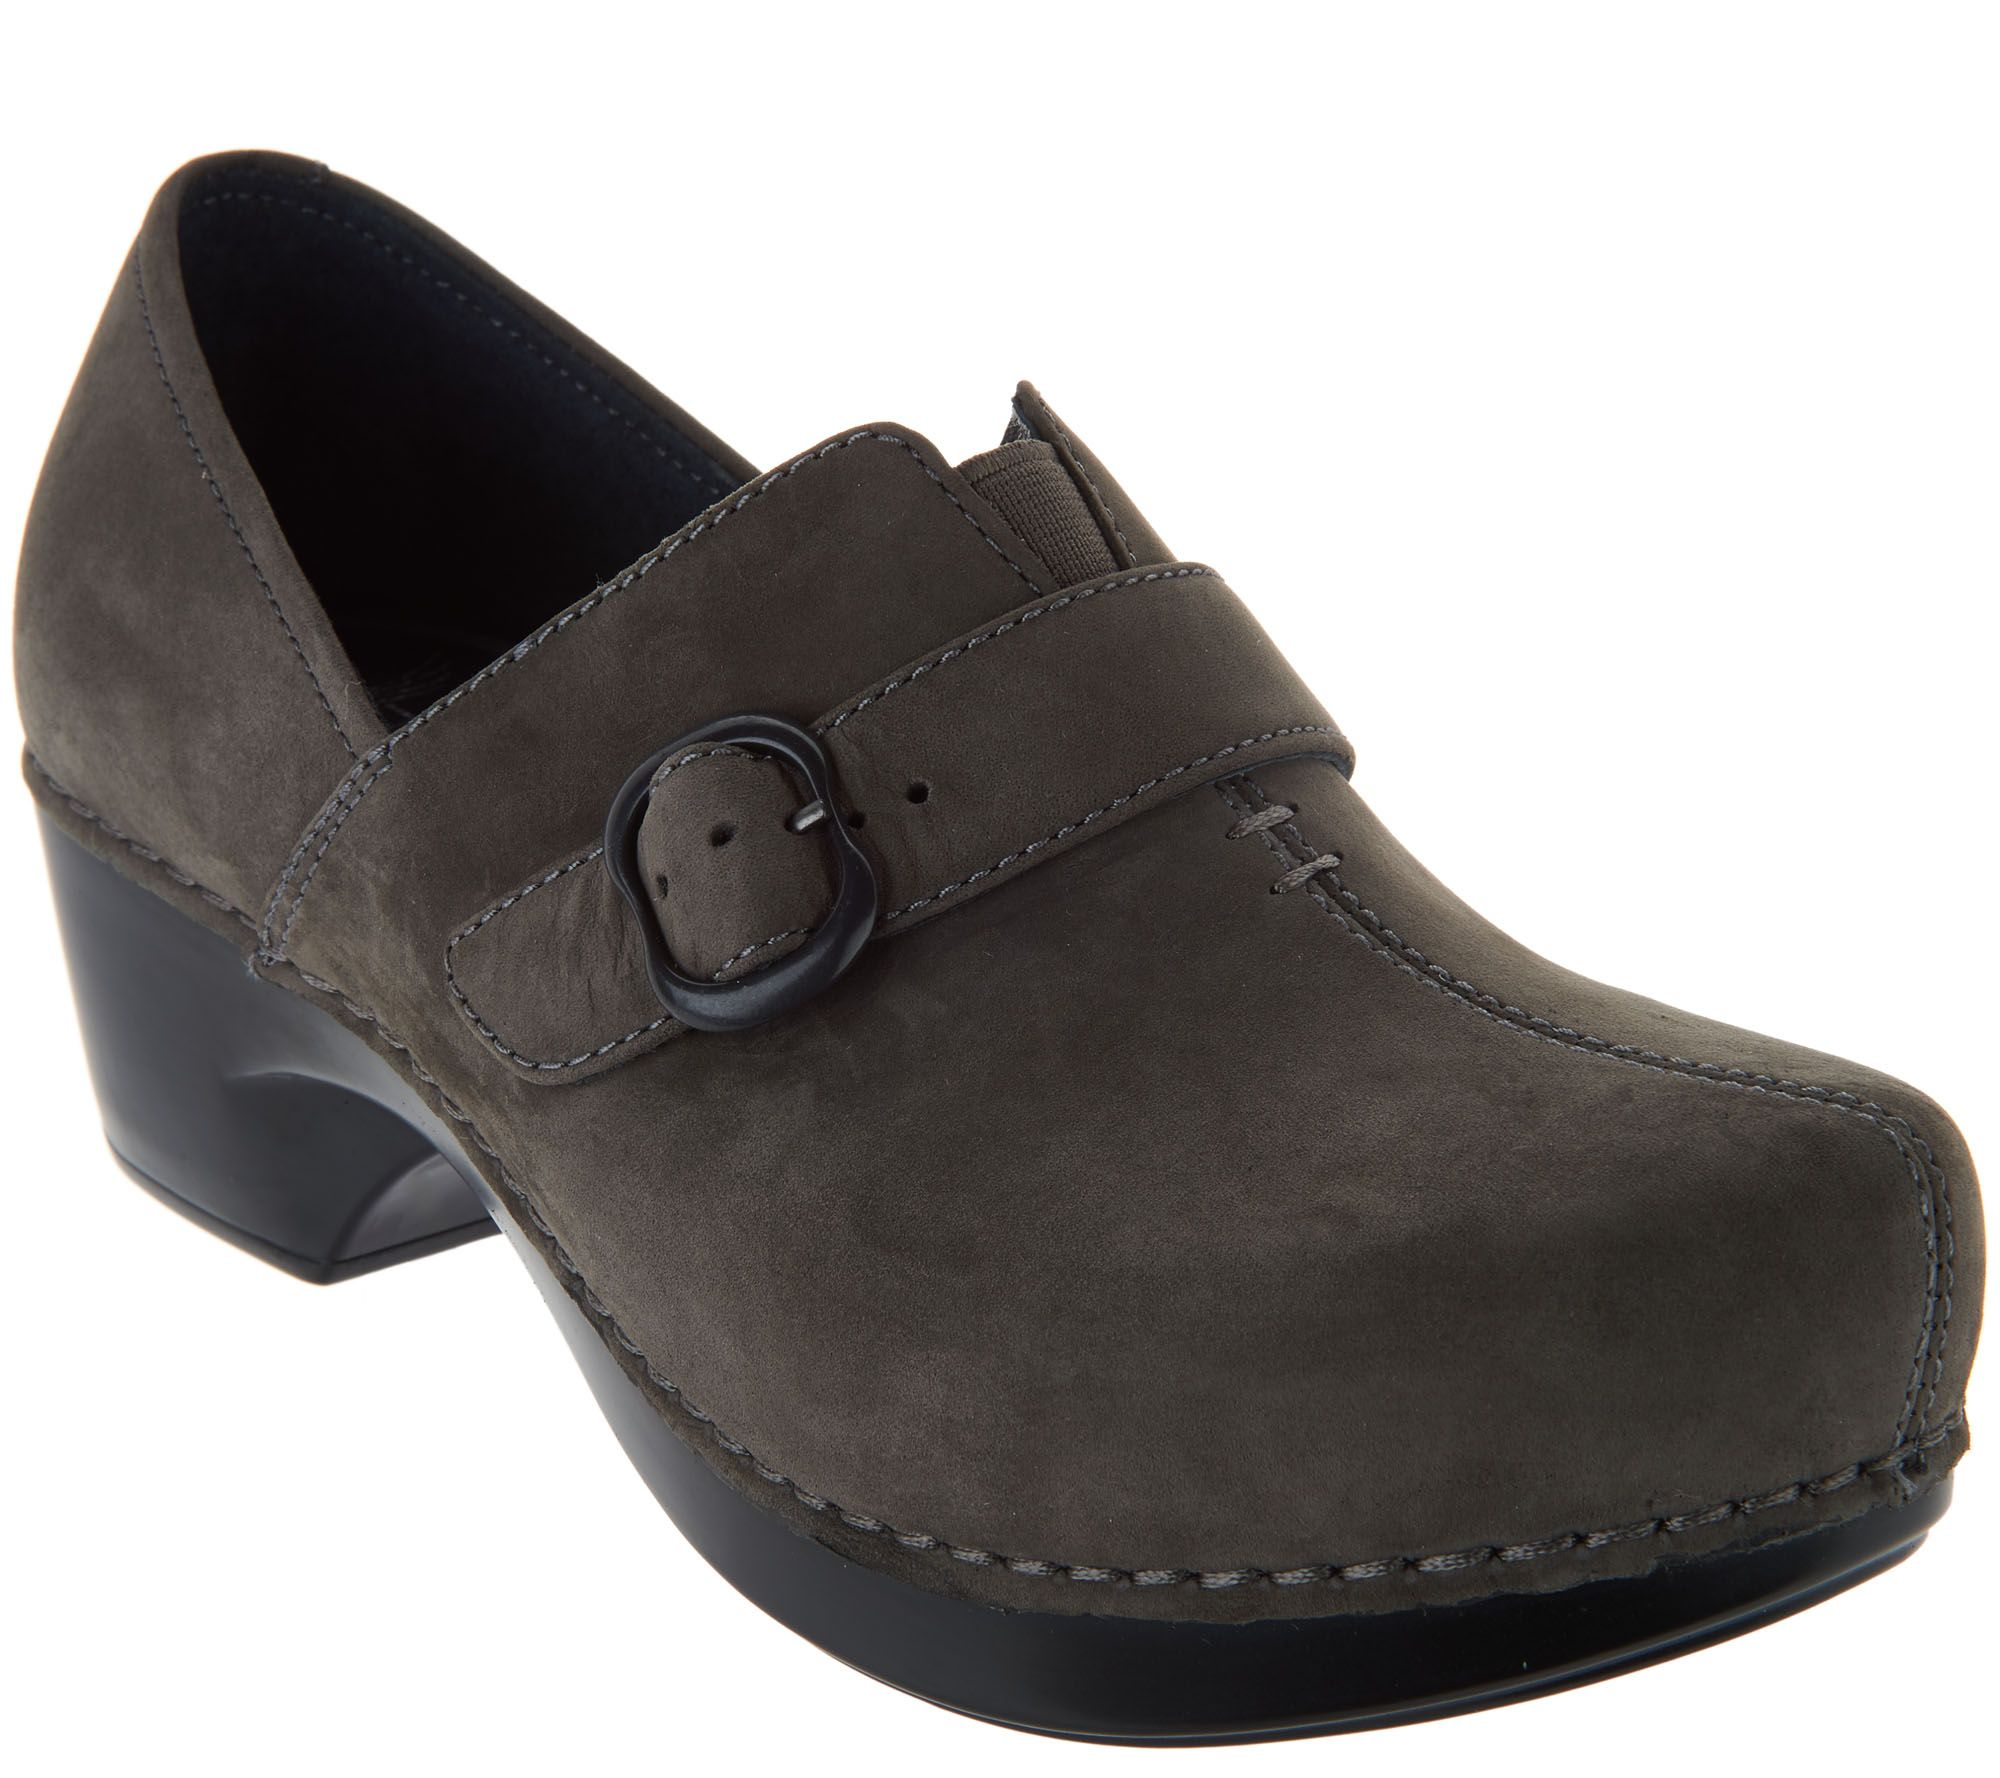 Dansko Leather Nubuck Stain Resistant Slip On Shoes Tamara Page 1